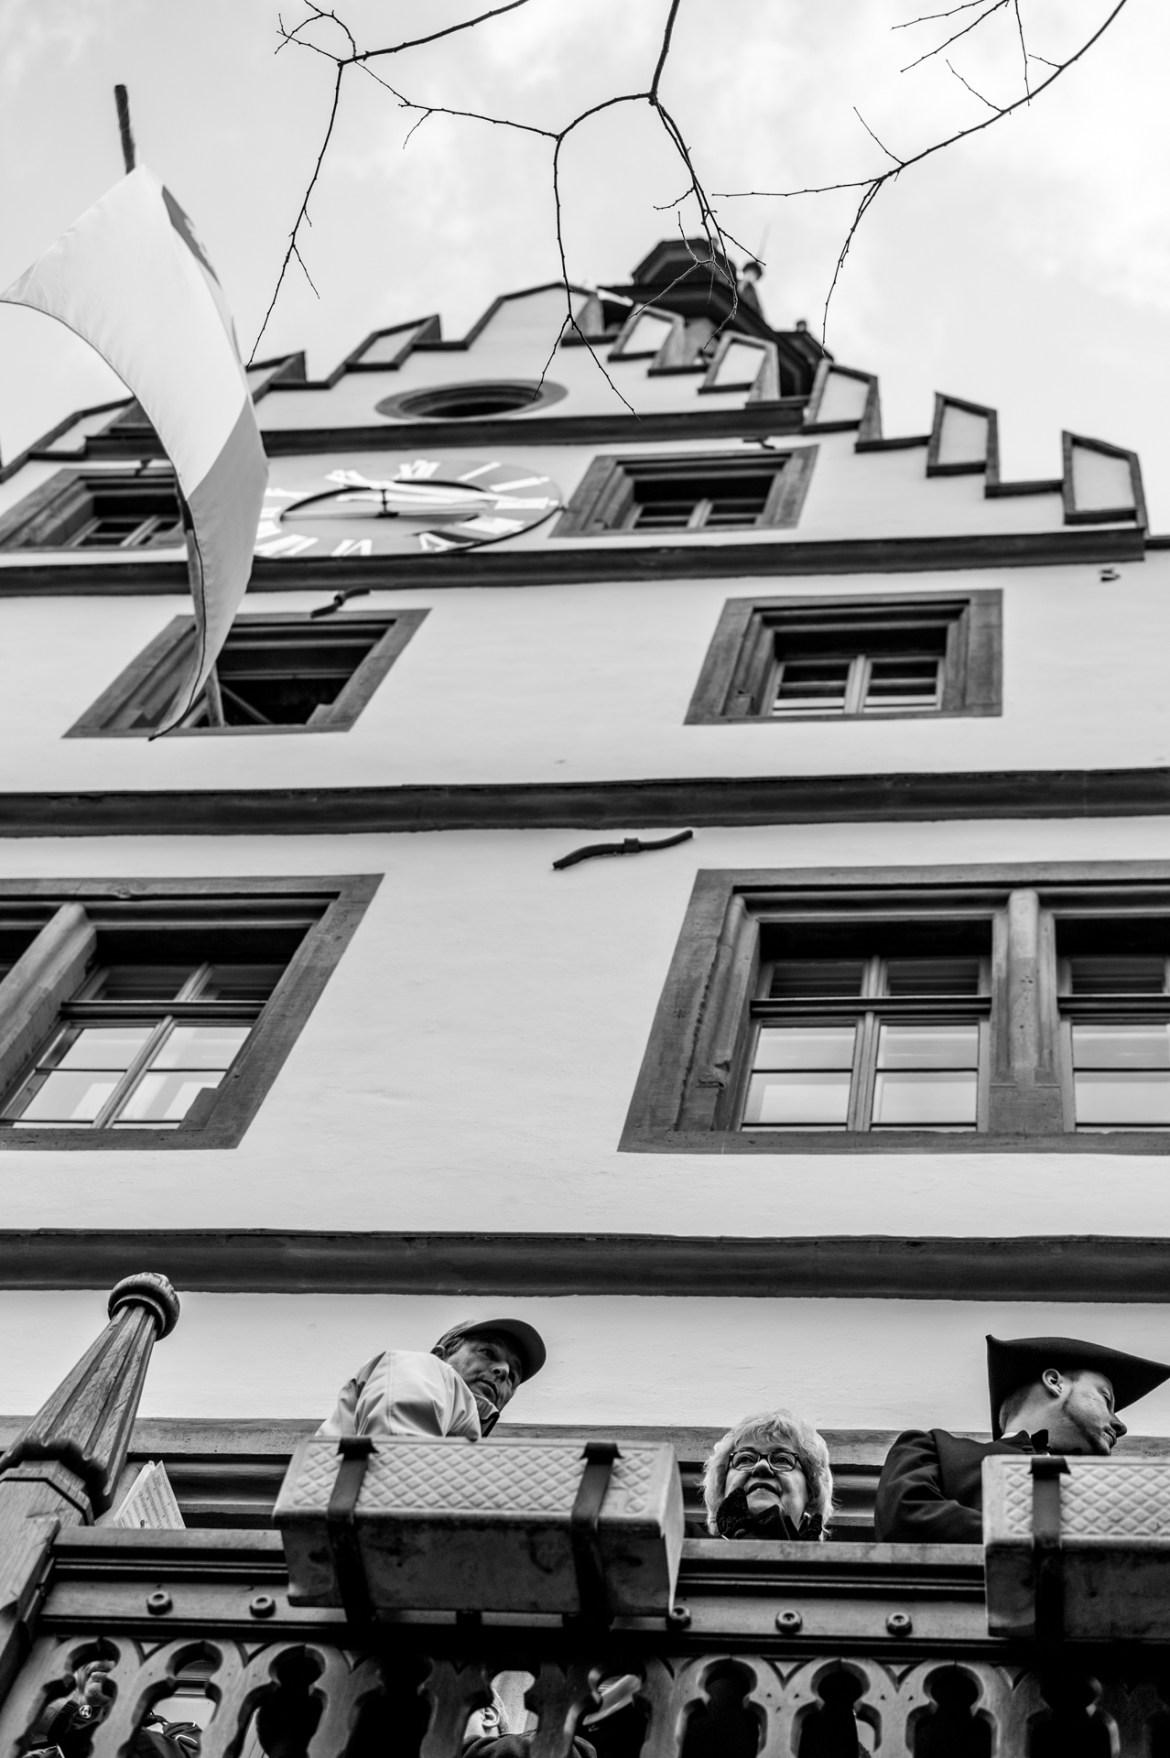 Sommertagszug2015-1000702 by Roger Schäfer.